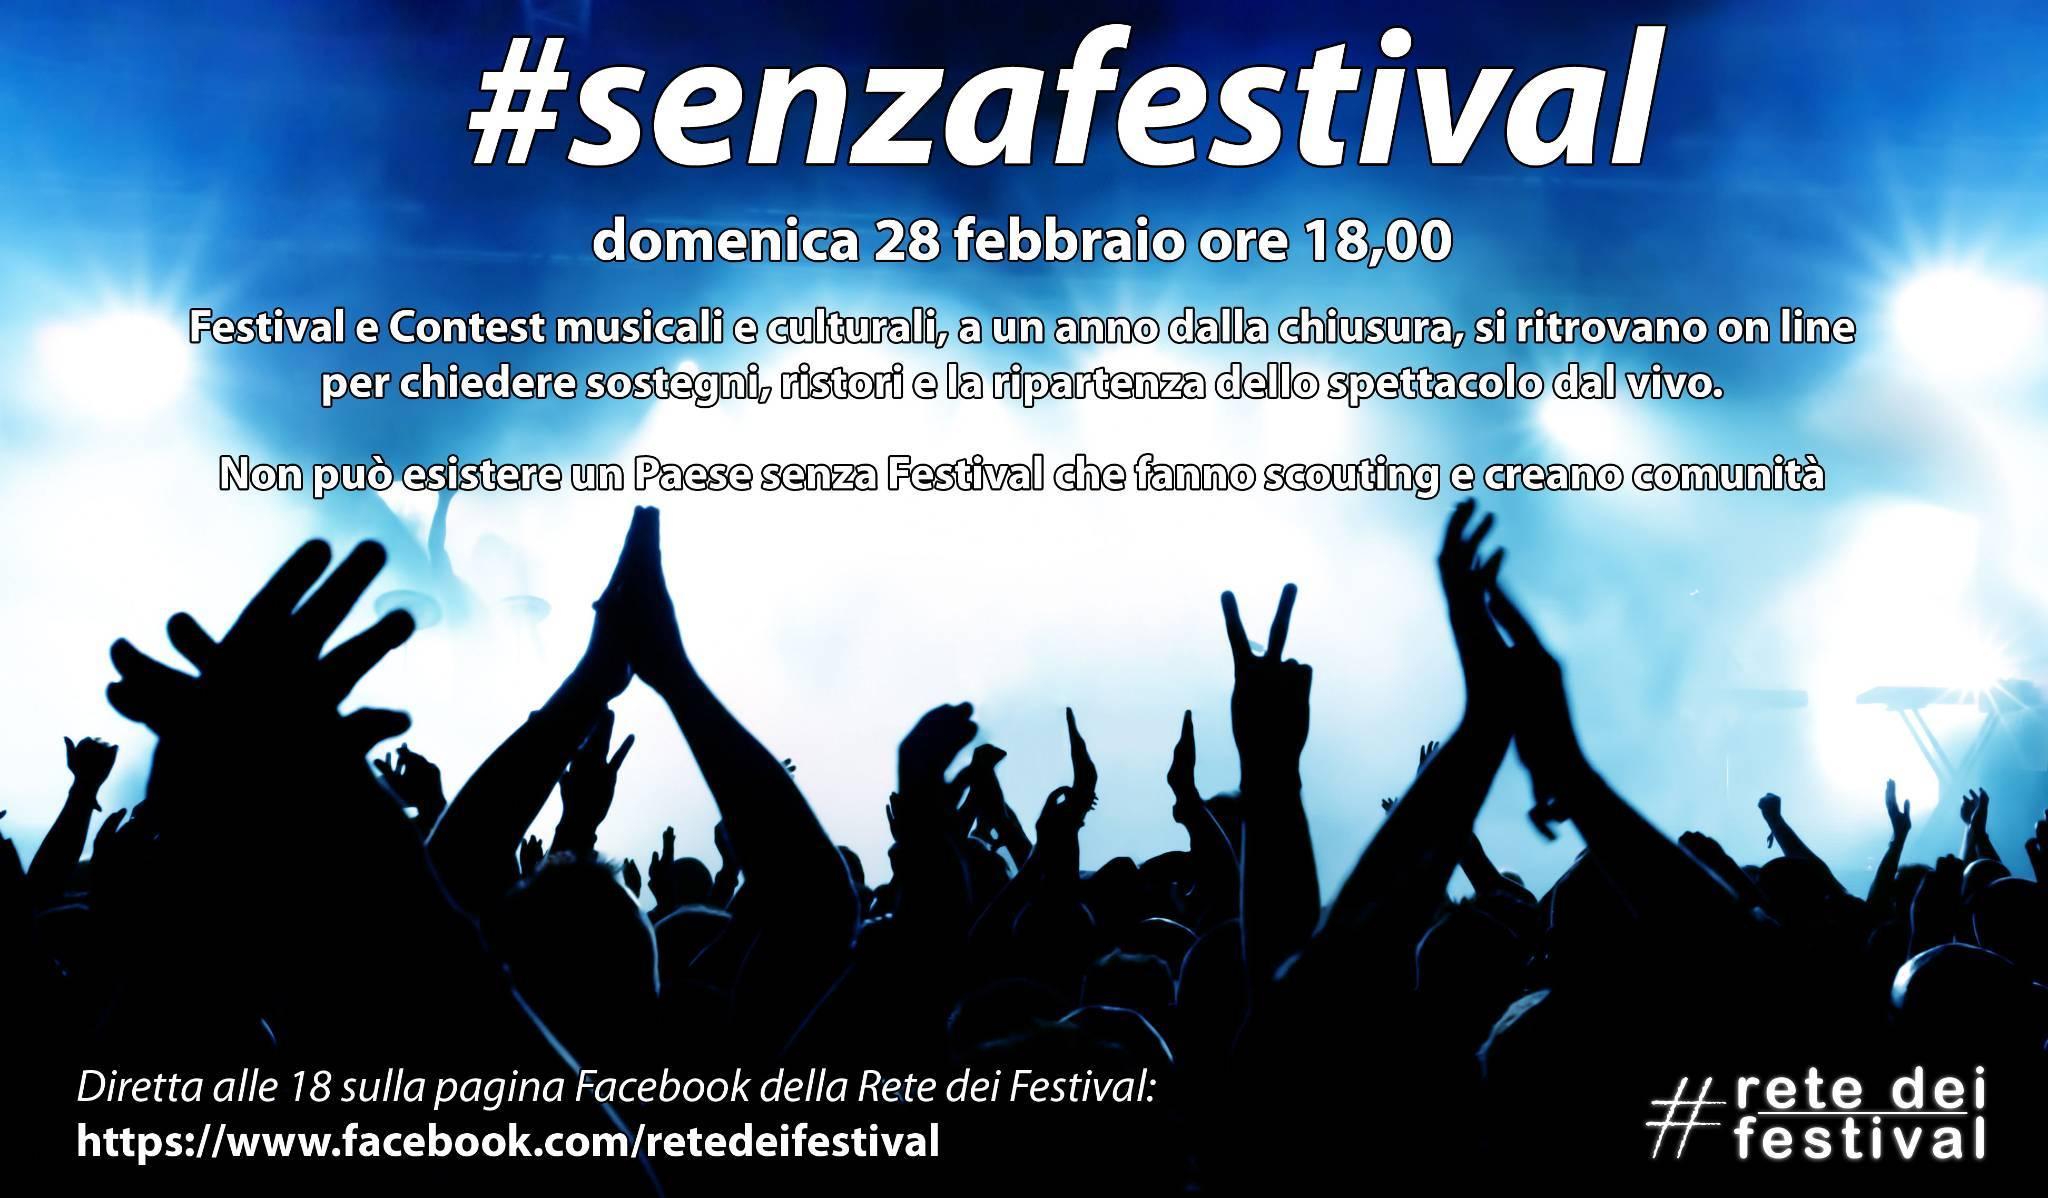 #senzafestival